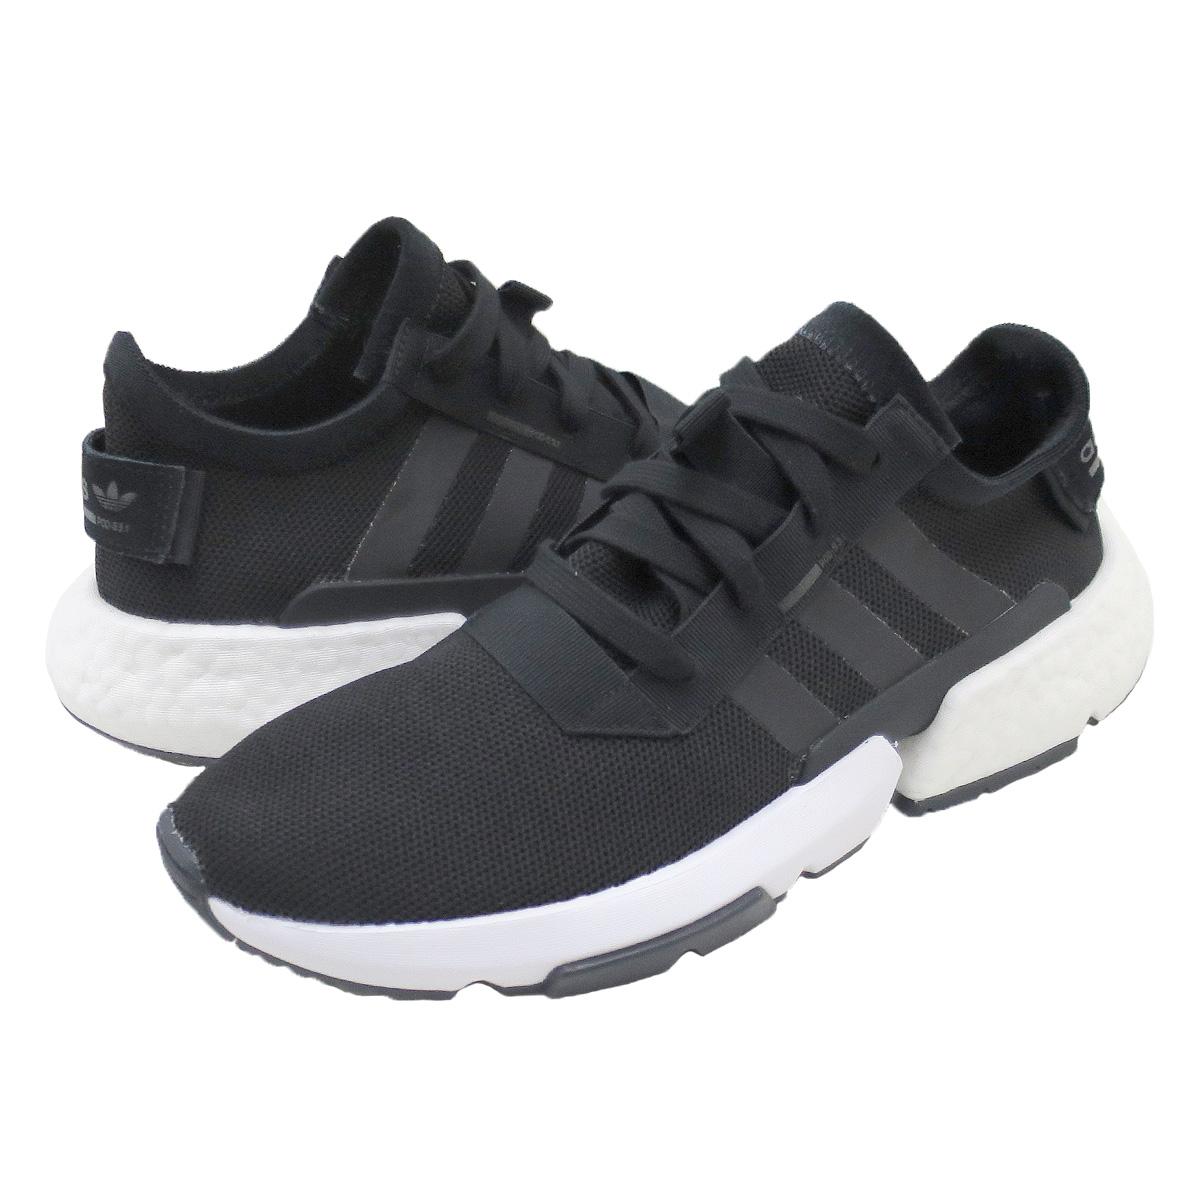 adidas POD S3.1 KICKS LAB. Adidas POD S3.1 kicks laboratory CORE BLACKRUNNING WHITERUNNING WHITE ee9695